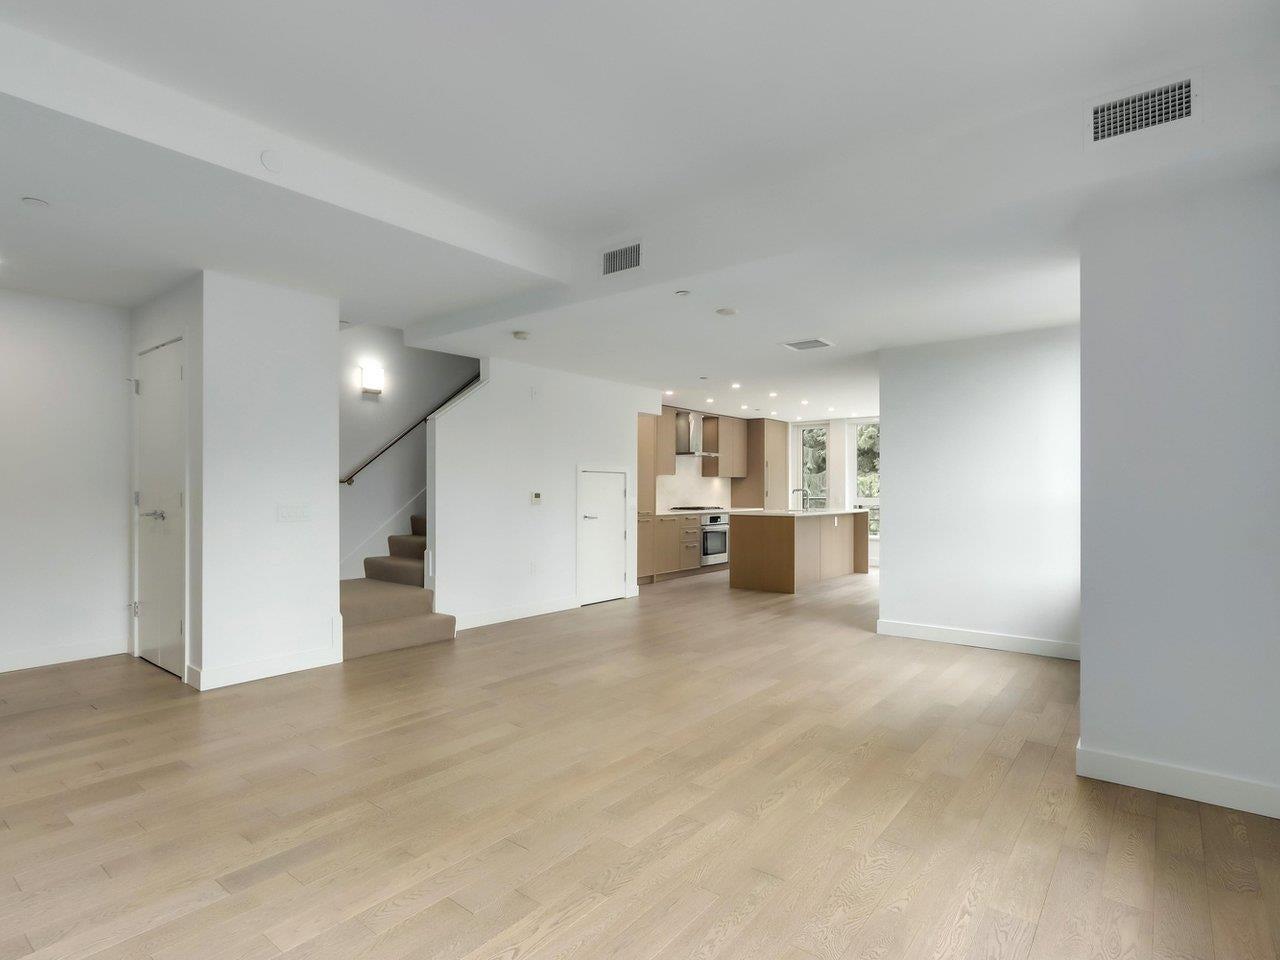 202 1055 RIDGEWOOD DRIVE - Edgemont Townhouse for sale, 3 Bedrooms (R2611487) - #5